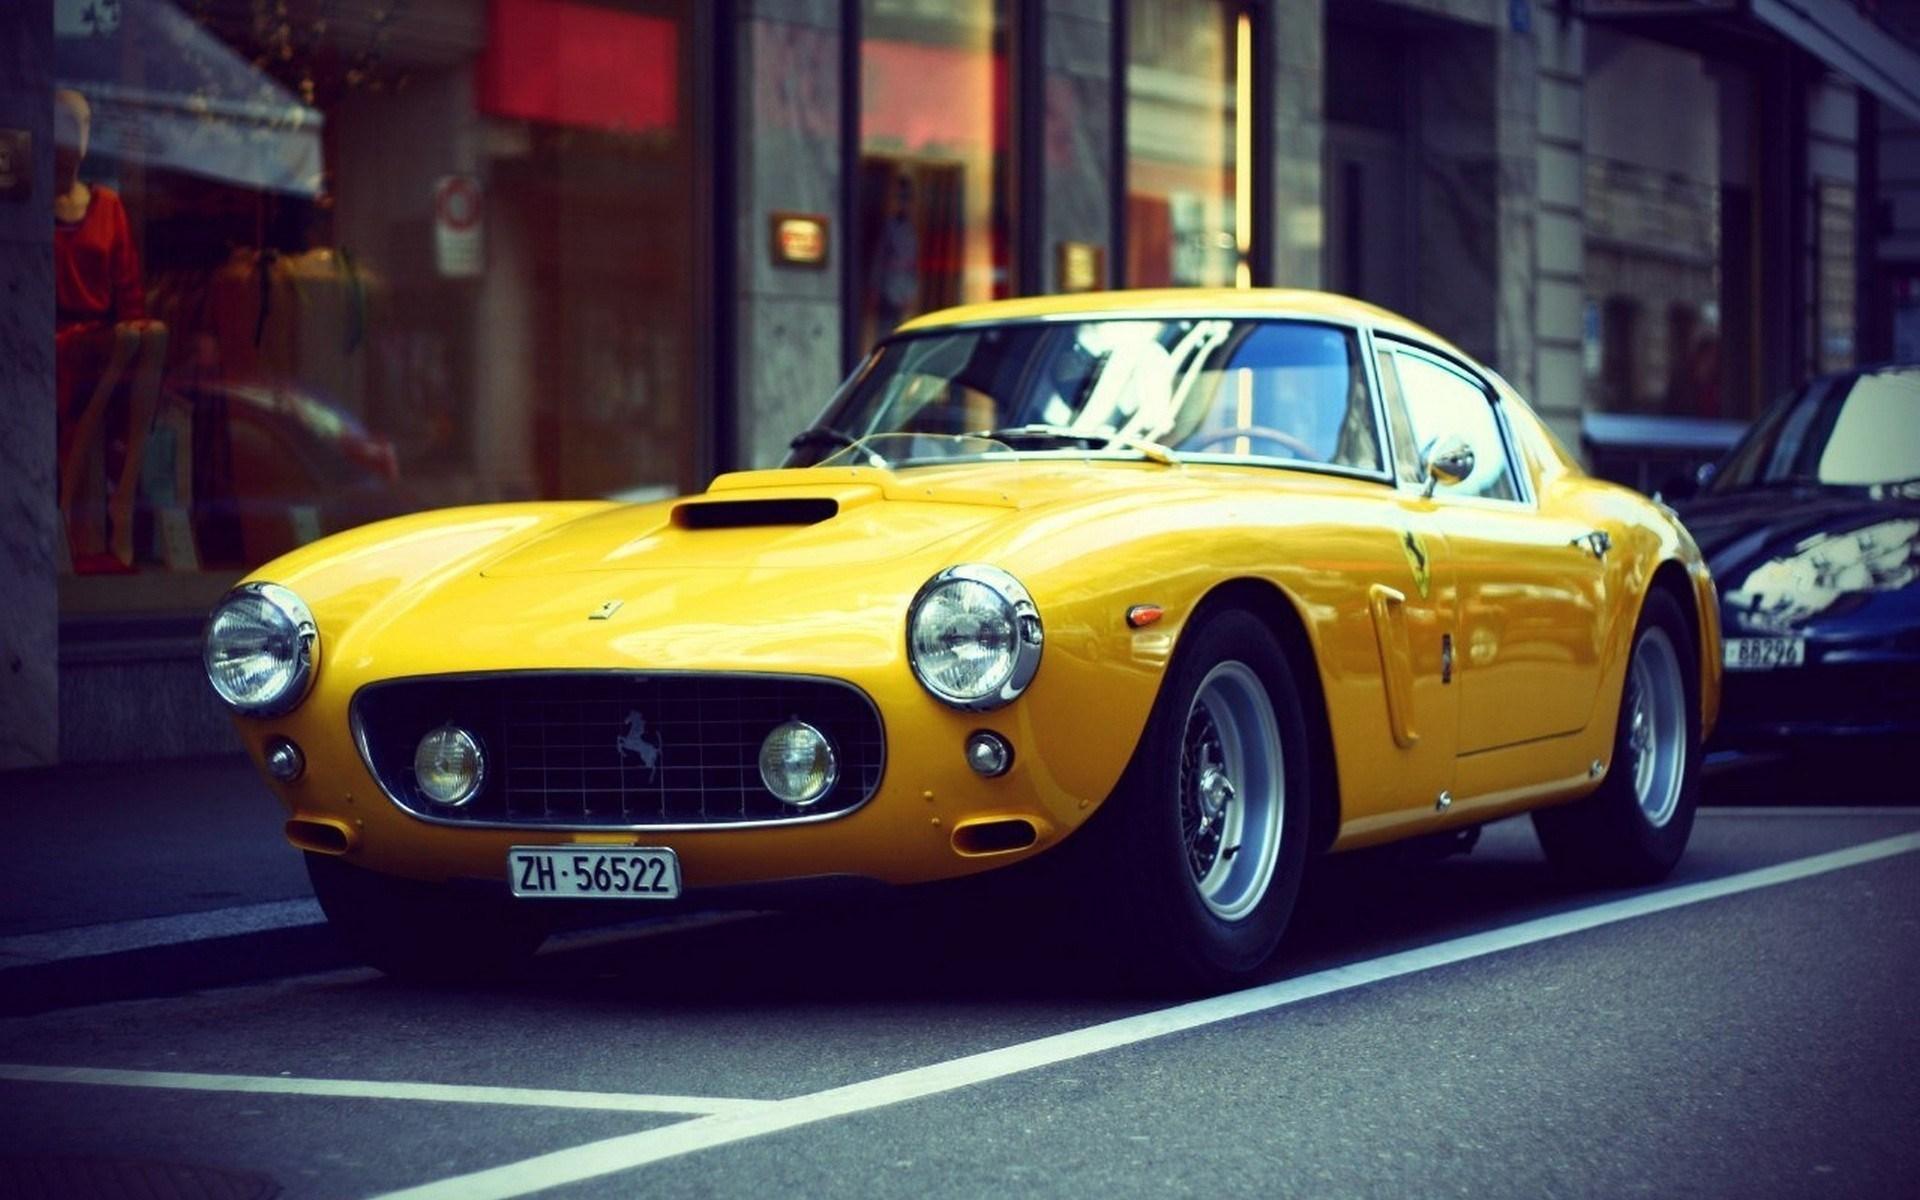 Vintage Yellow Ferrari Classic Car Switzerland Parking